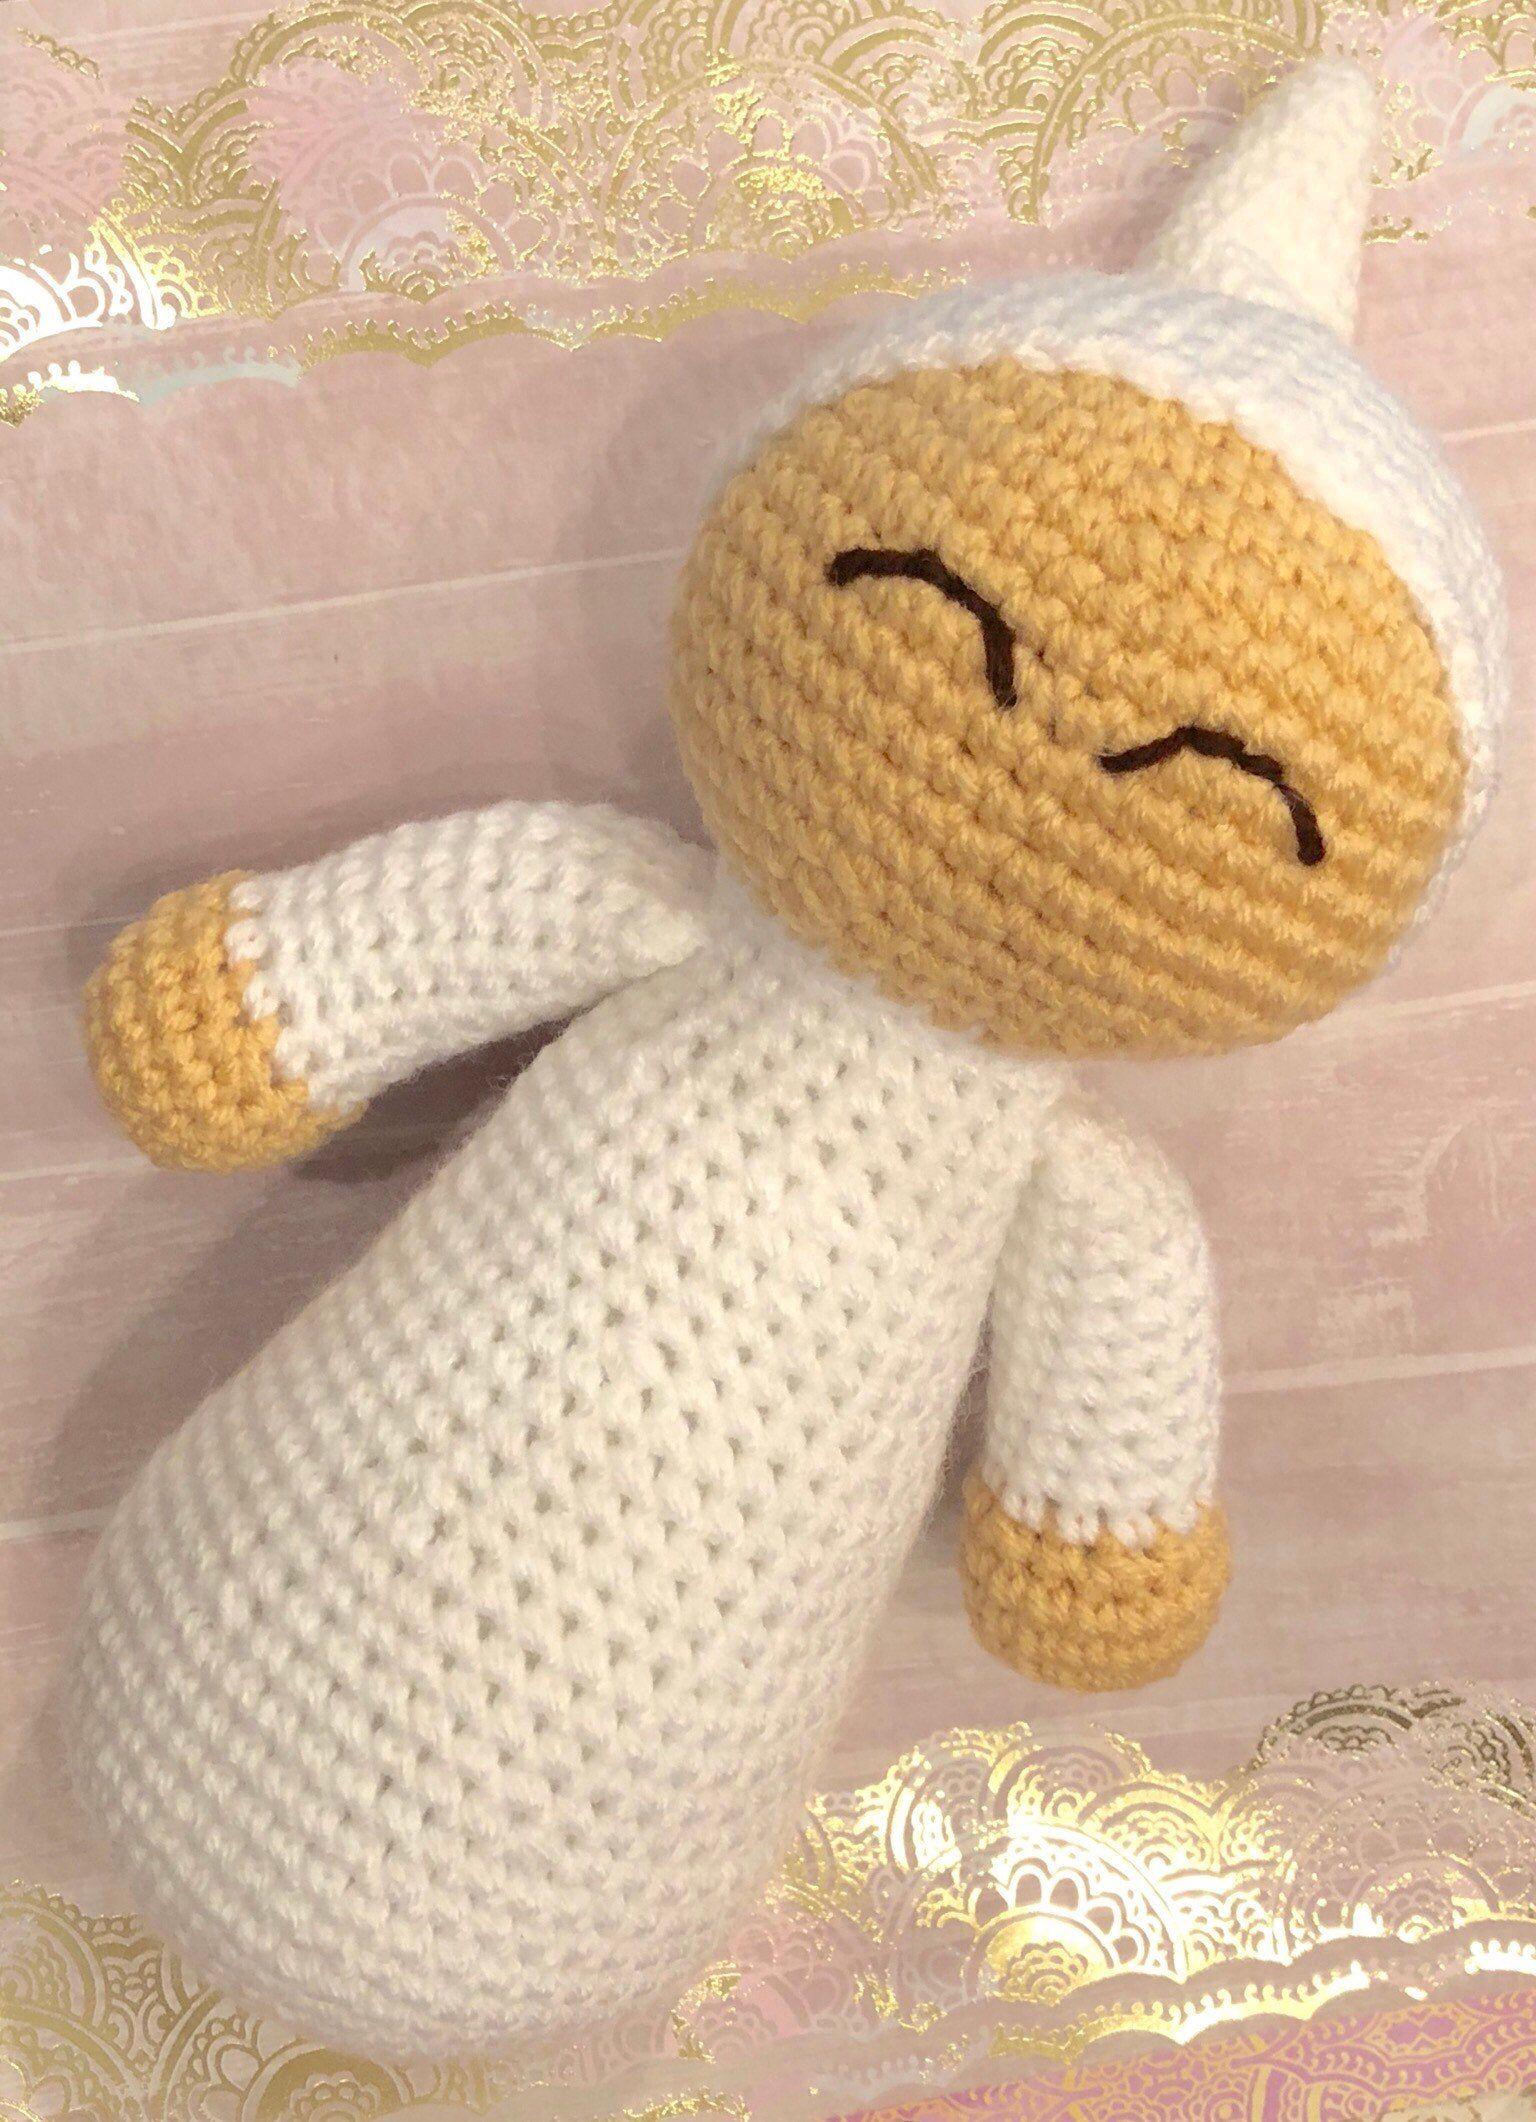 Crochet baby Crochet Baby Doll baby shower gift Imaginative play toy nursery decor Imaginative play Toddler toy Sleeping Baby doll